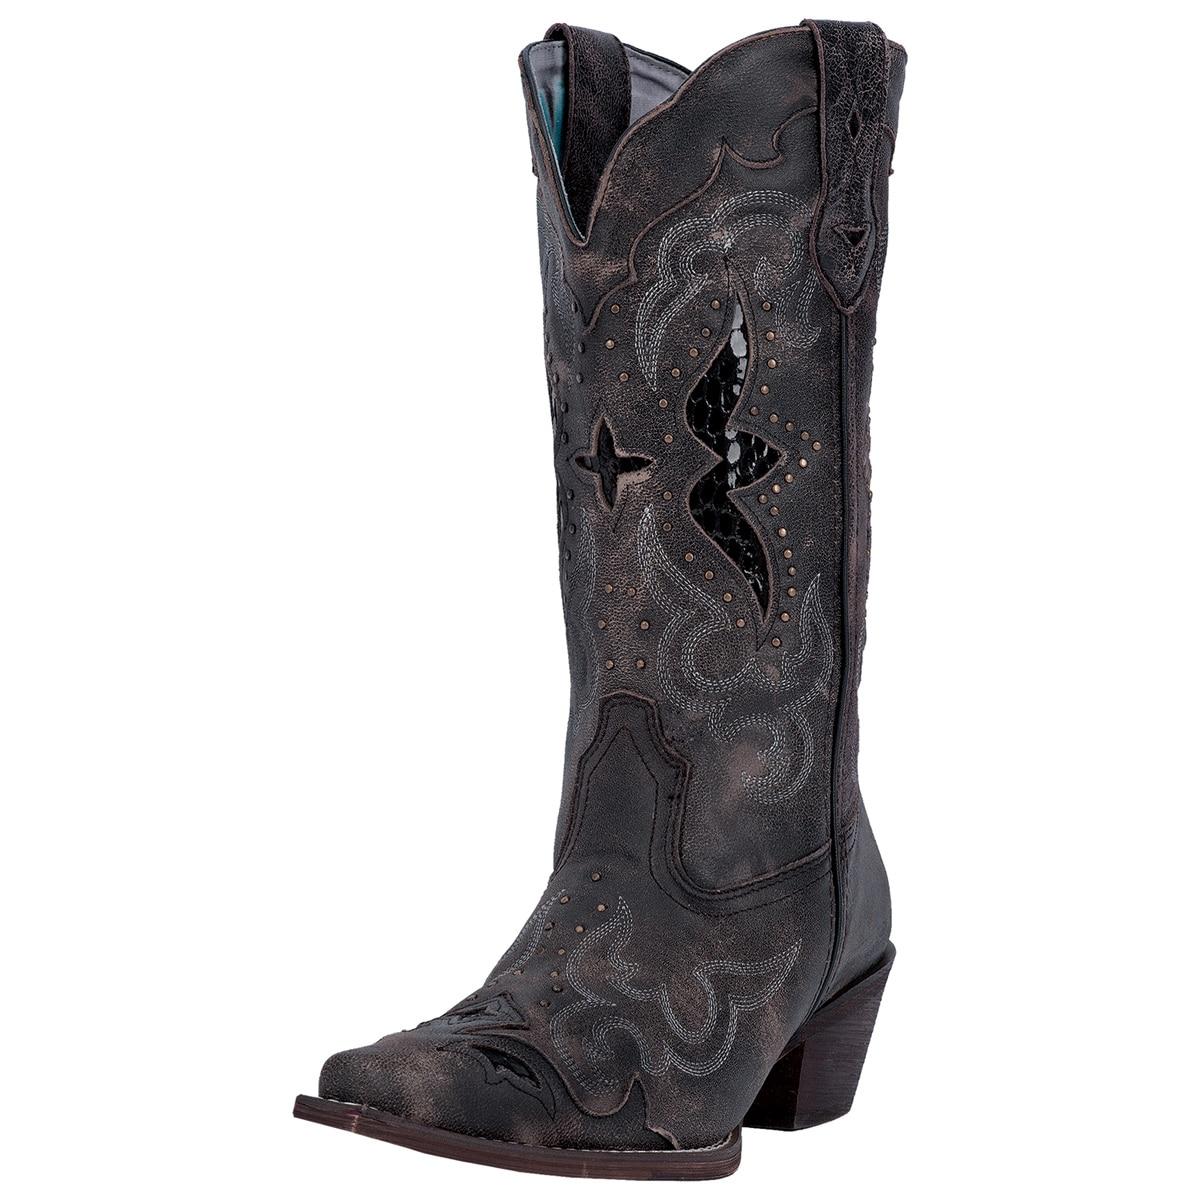 7f1bceeab705 Laredo Women s Lucretia Boots